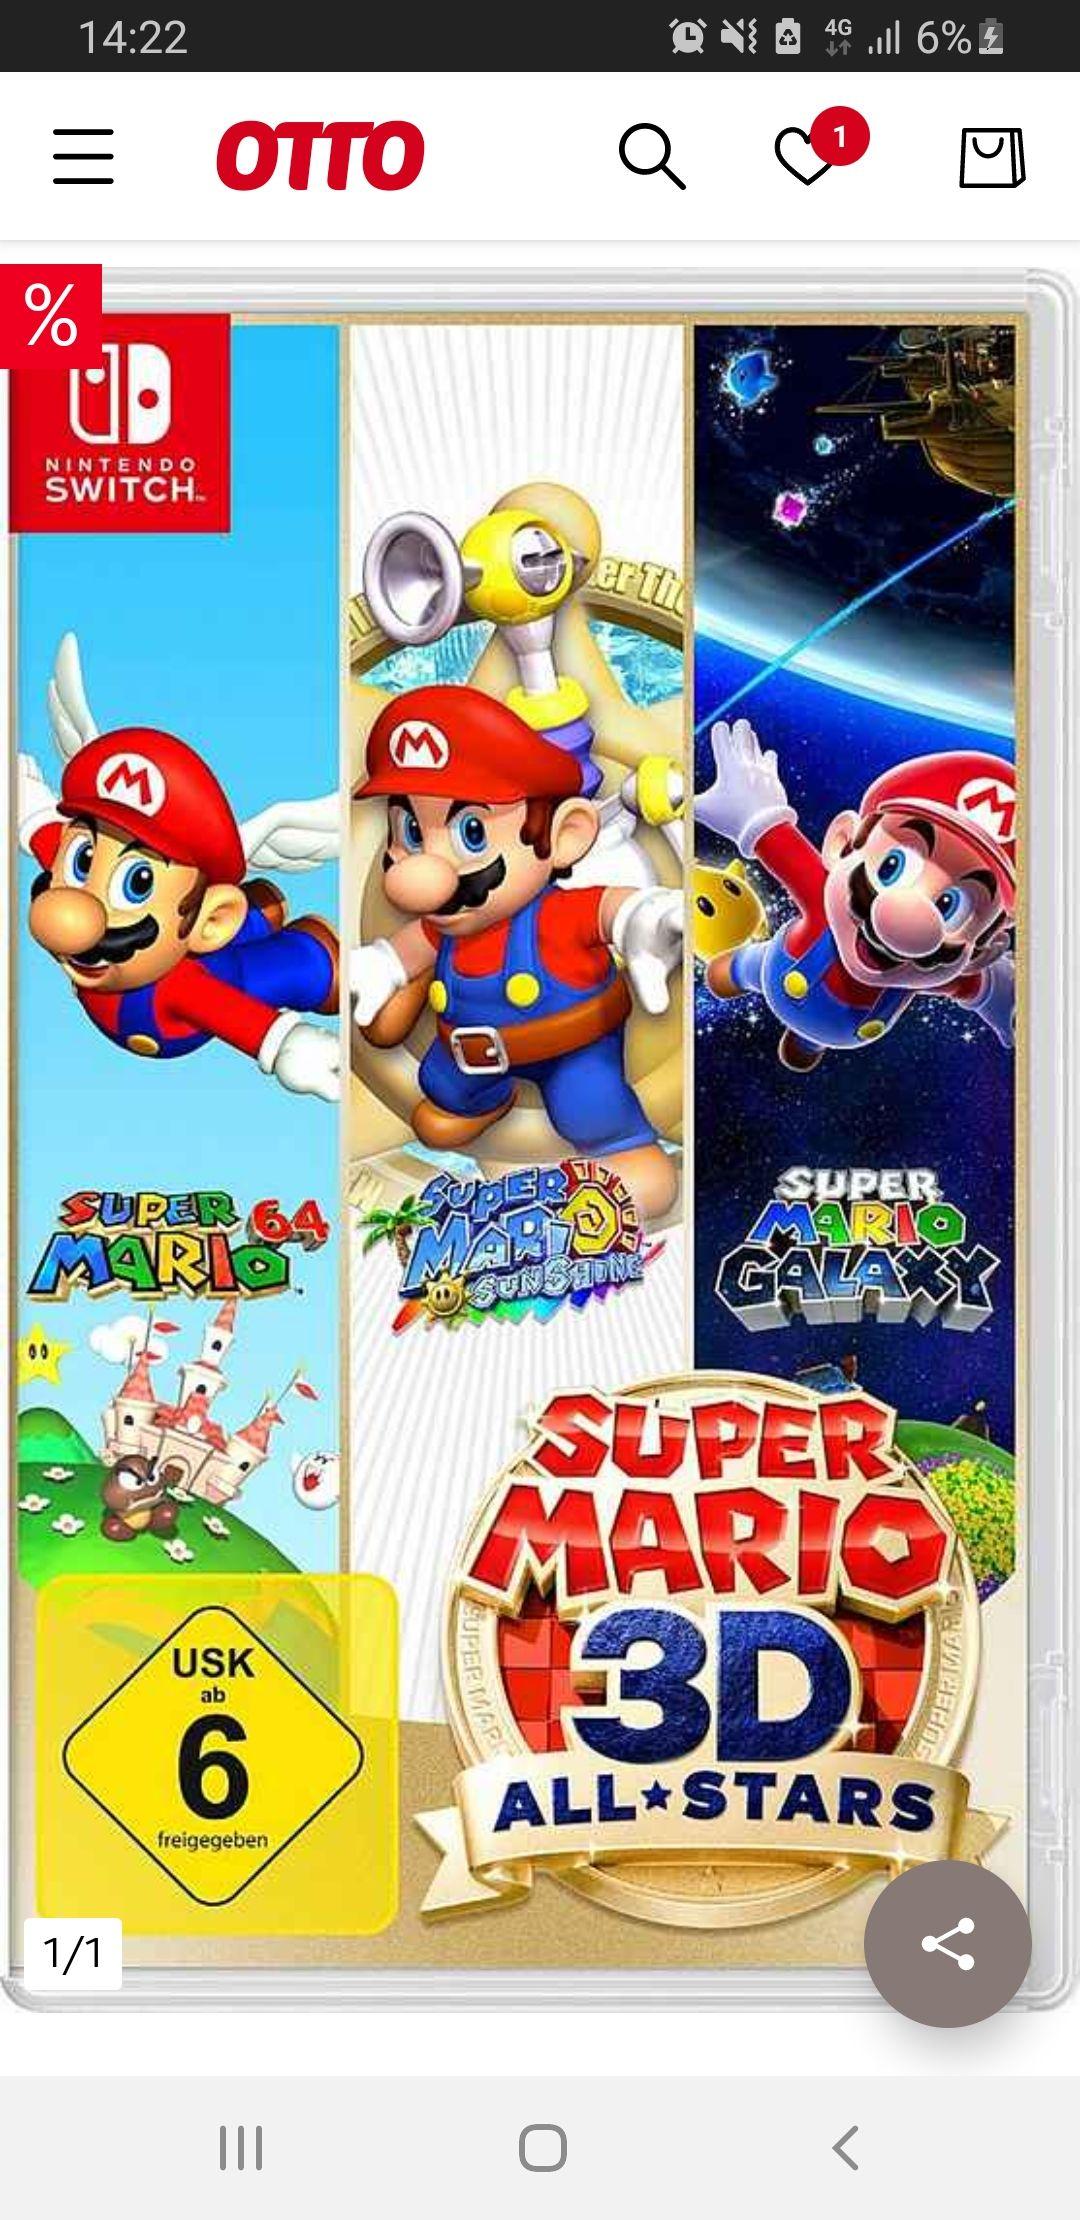 Super Mario 3D: All Stars - Nintendo Switch - (mit Otto Lieferflat 39,99€)